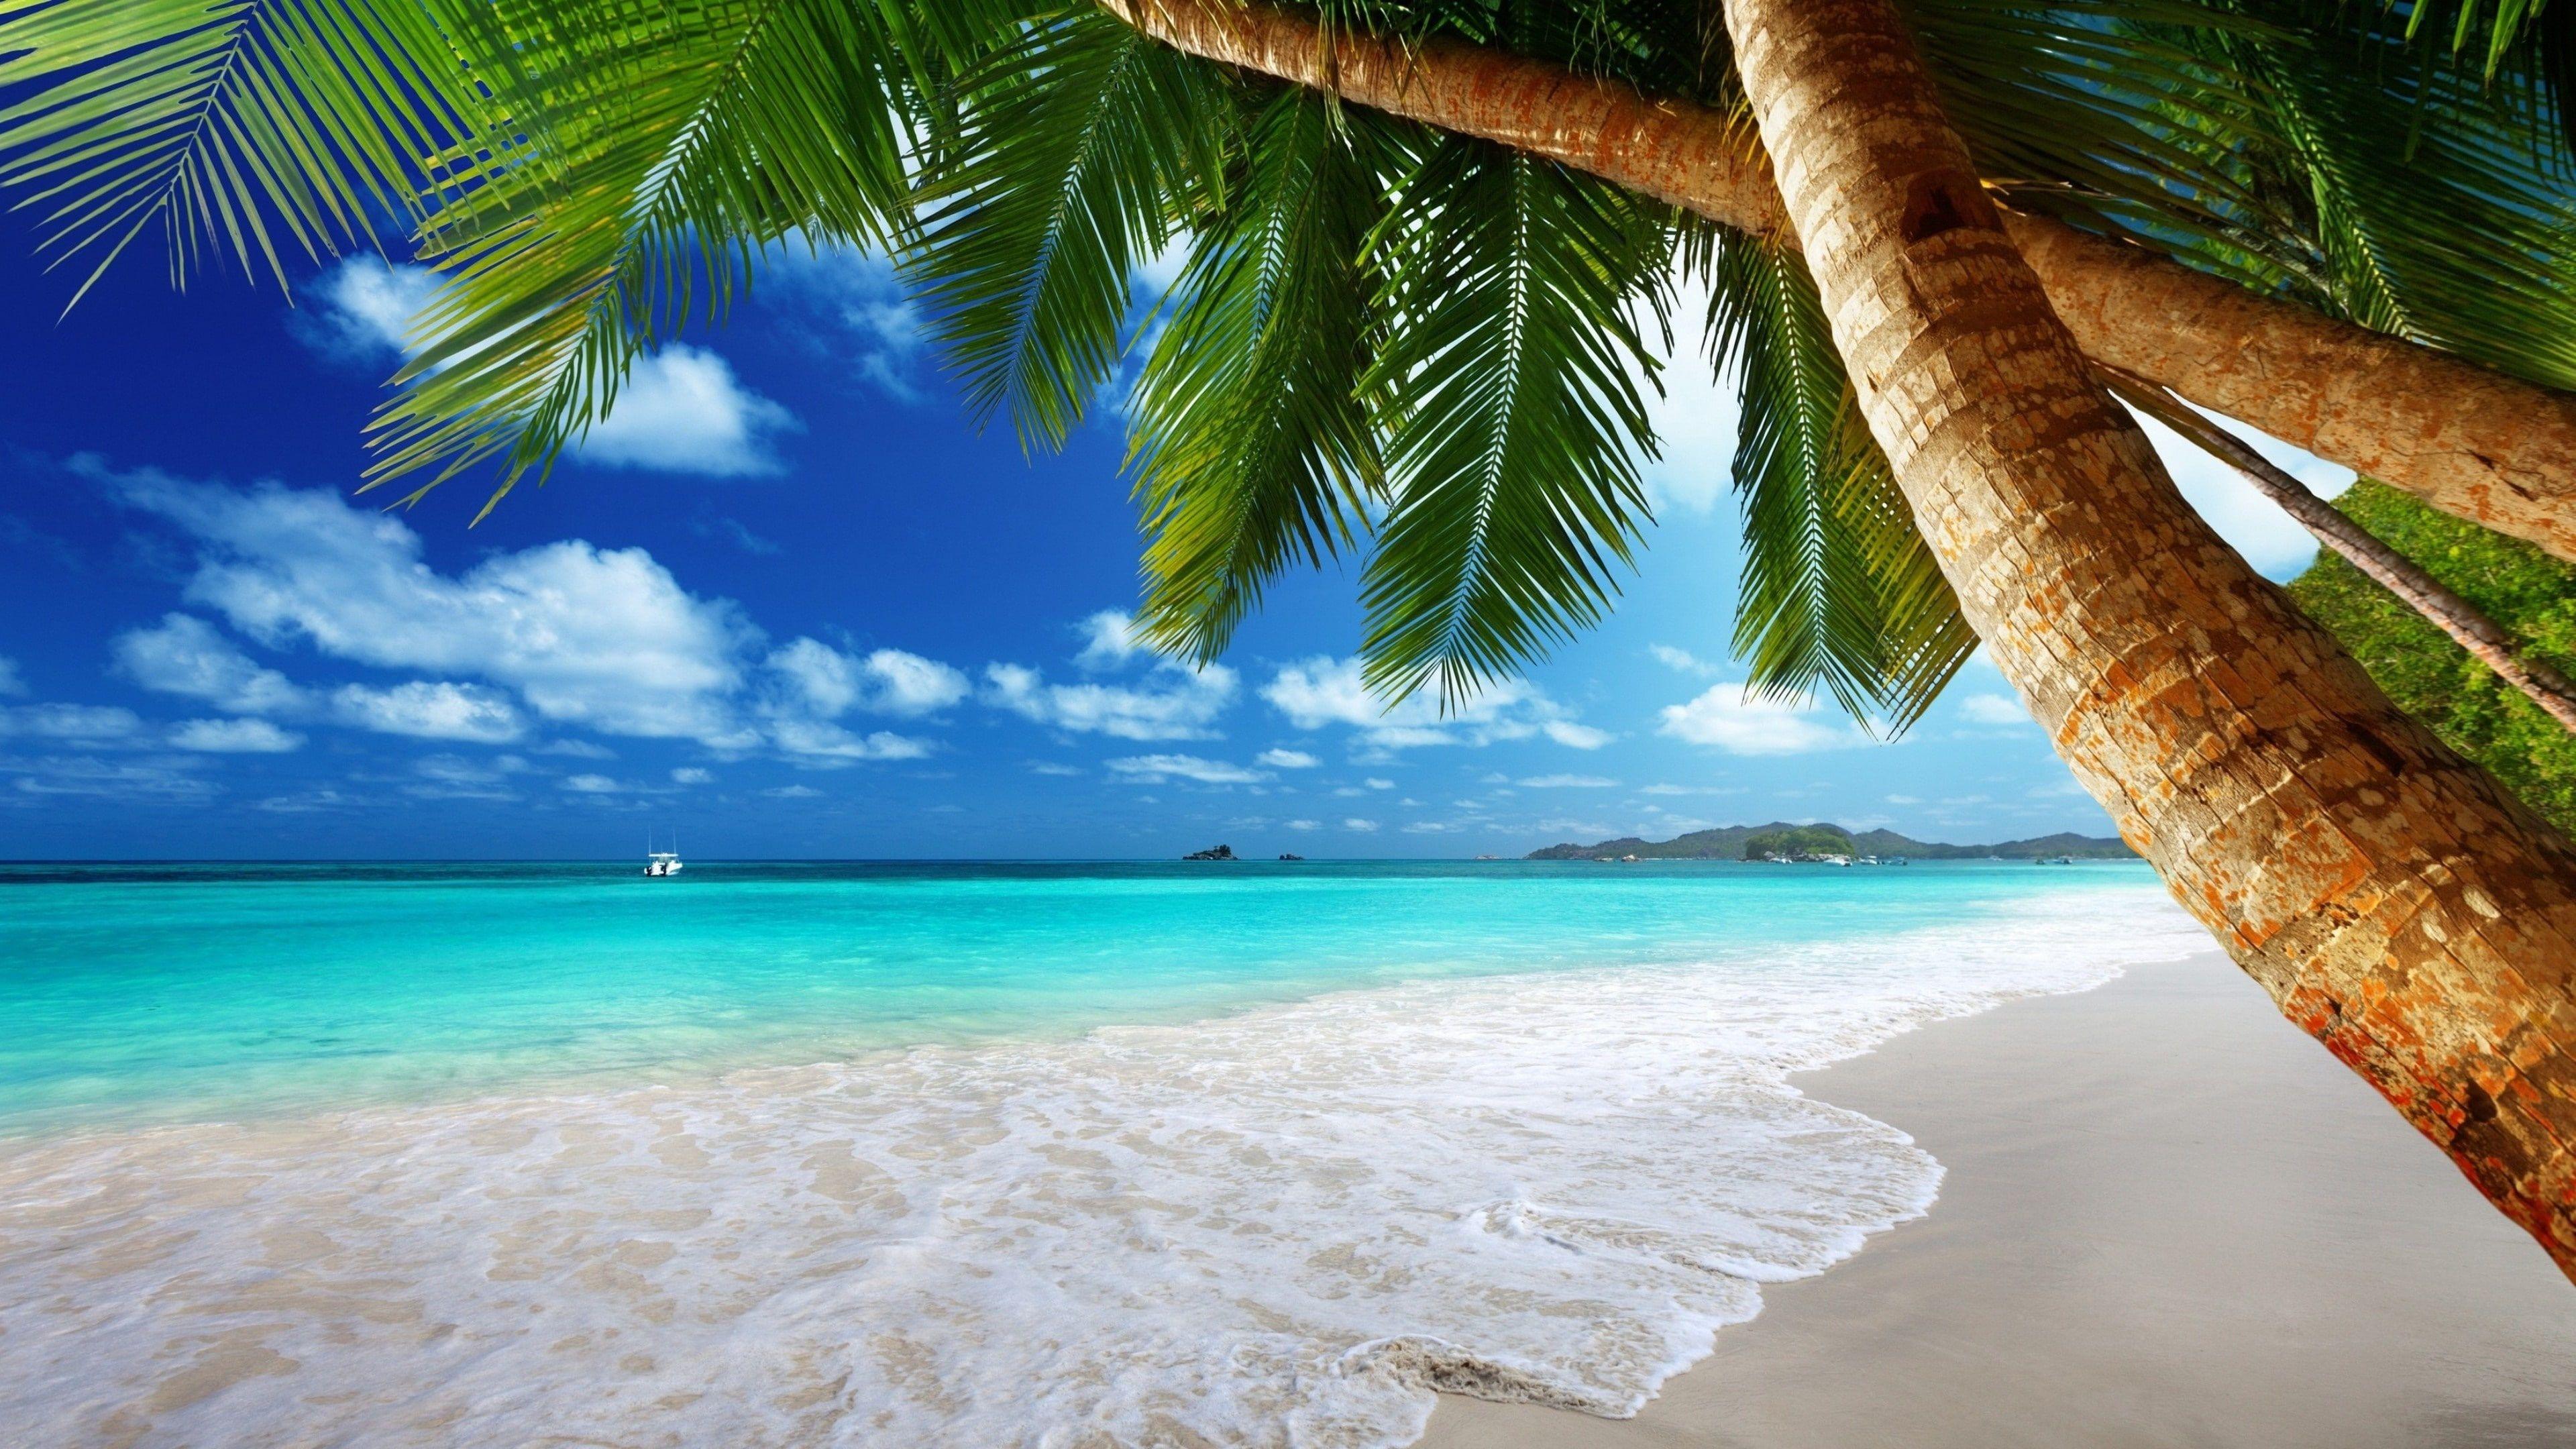 Vacation Summertime Tropical Tropical Landscape Lagoon Tree Water Tropical Beach Beach Sandy Bea In 2020 Nature Beach Tropical Landscaping Tropical Island Beach